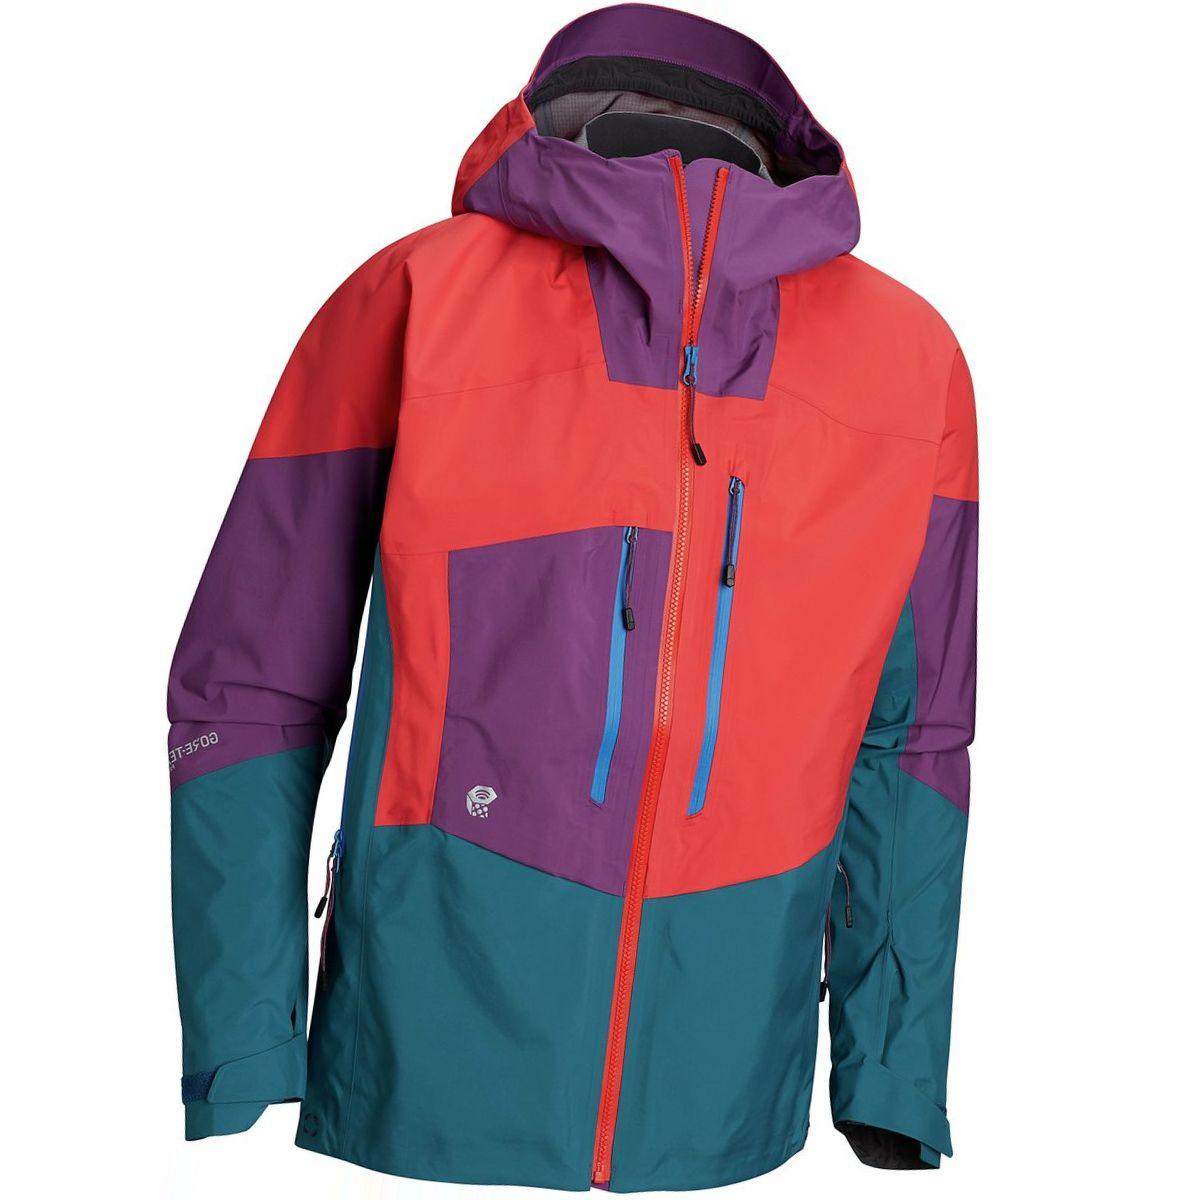 Mountain Hardwear Exposure/2 Gore-tex Pro Jacket - Men's